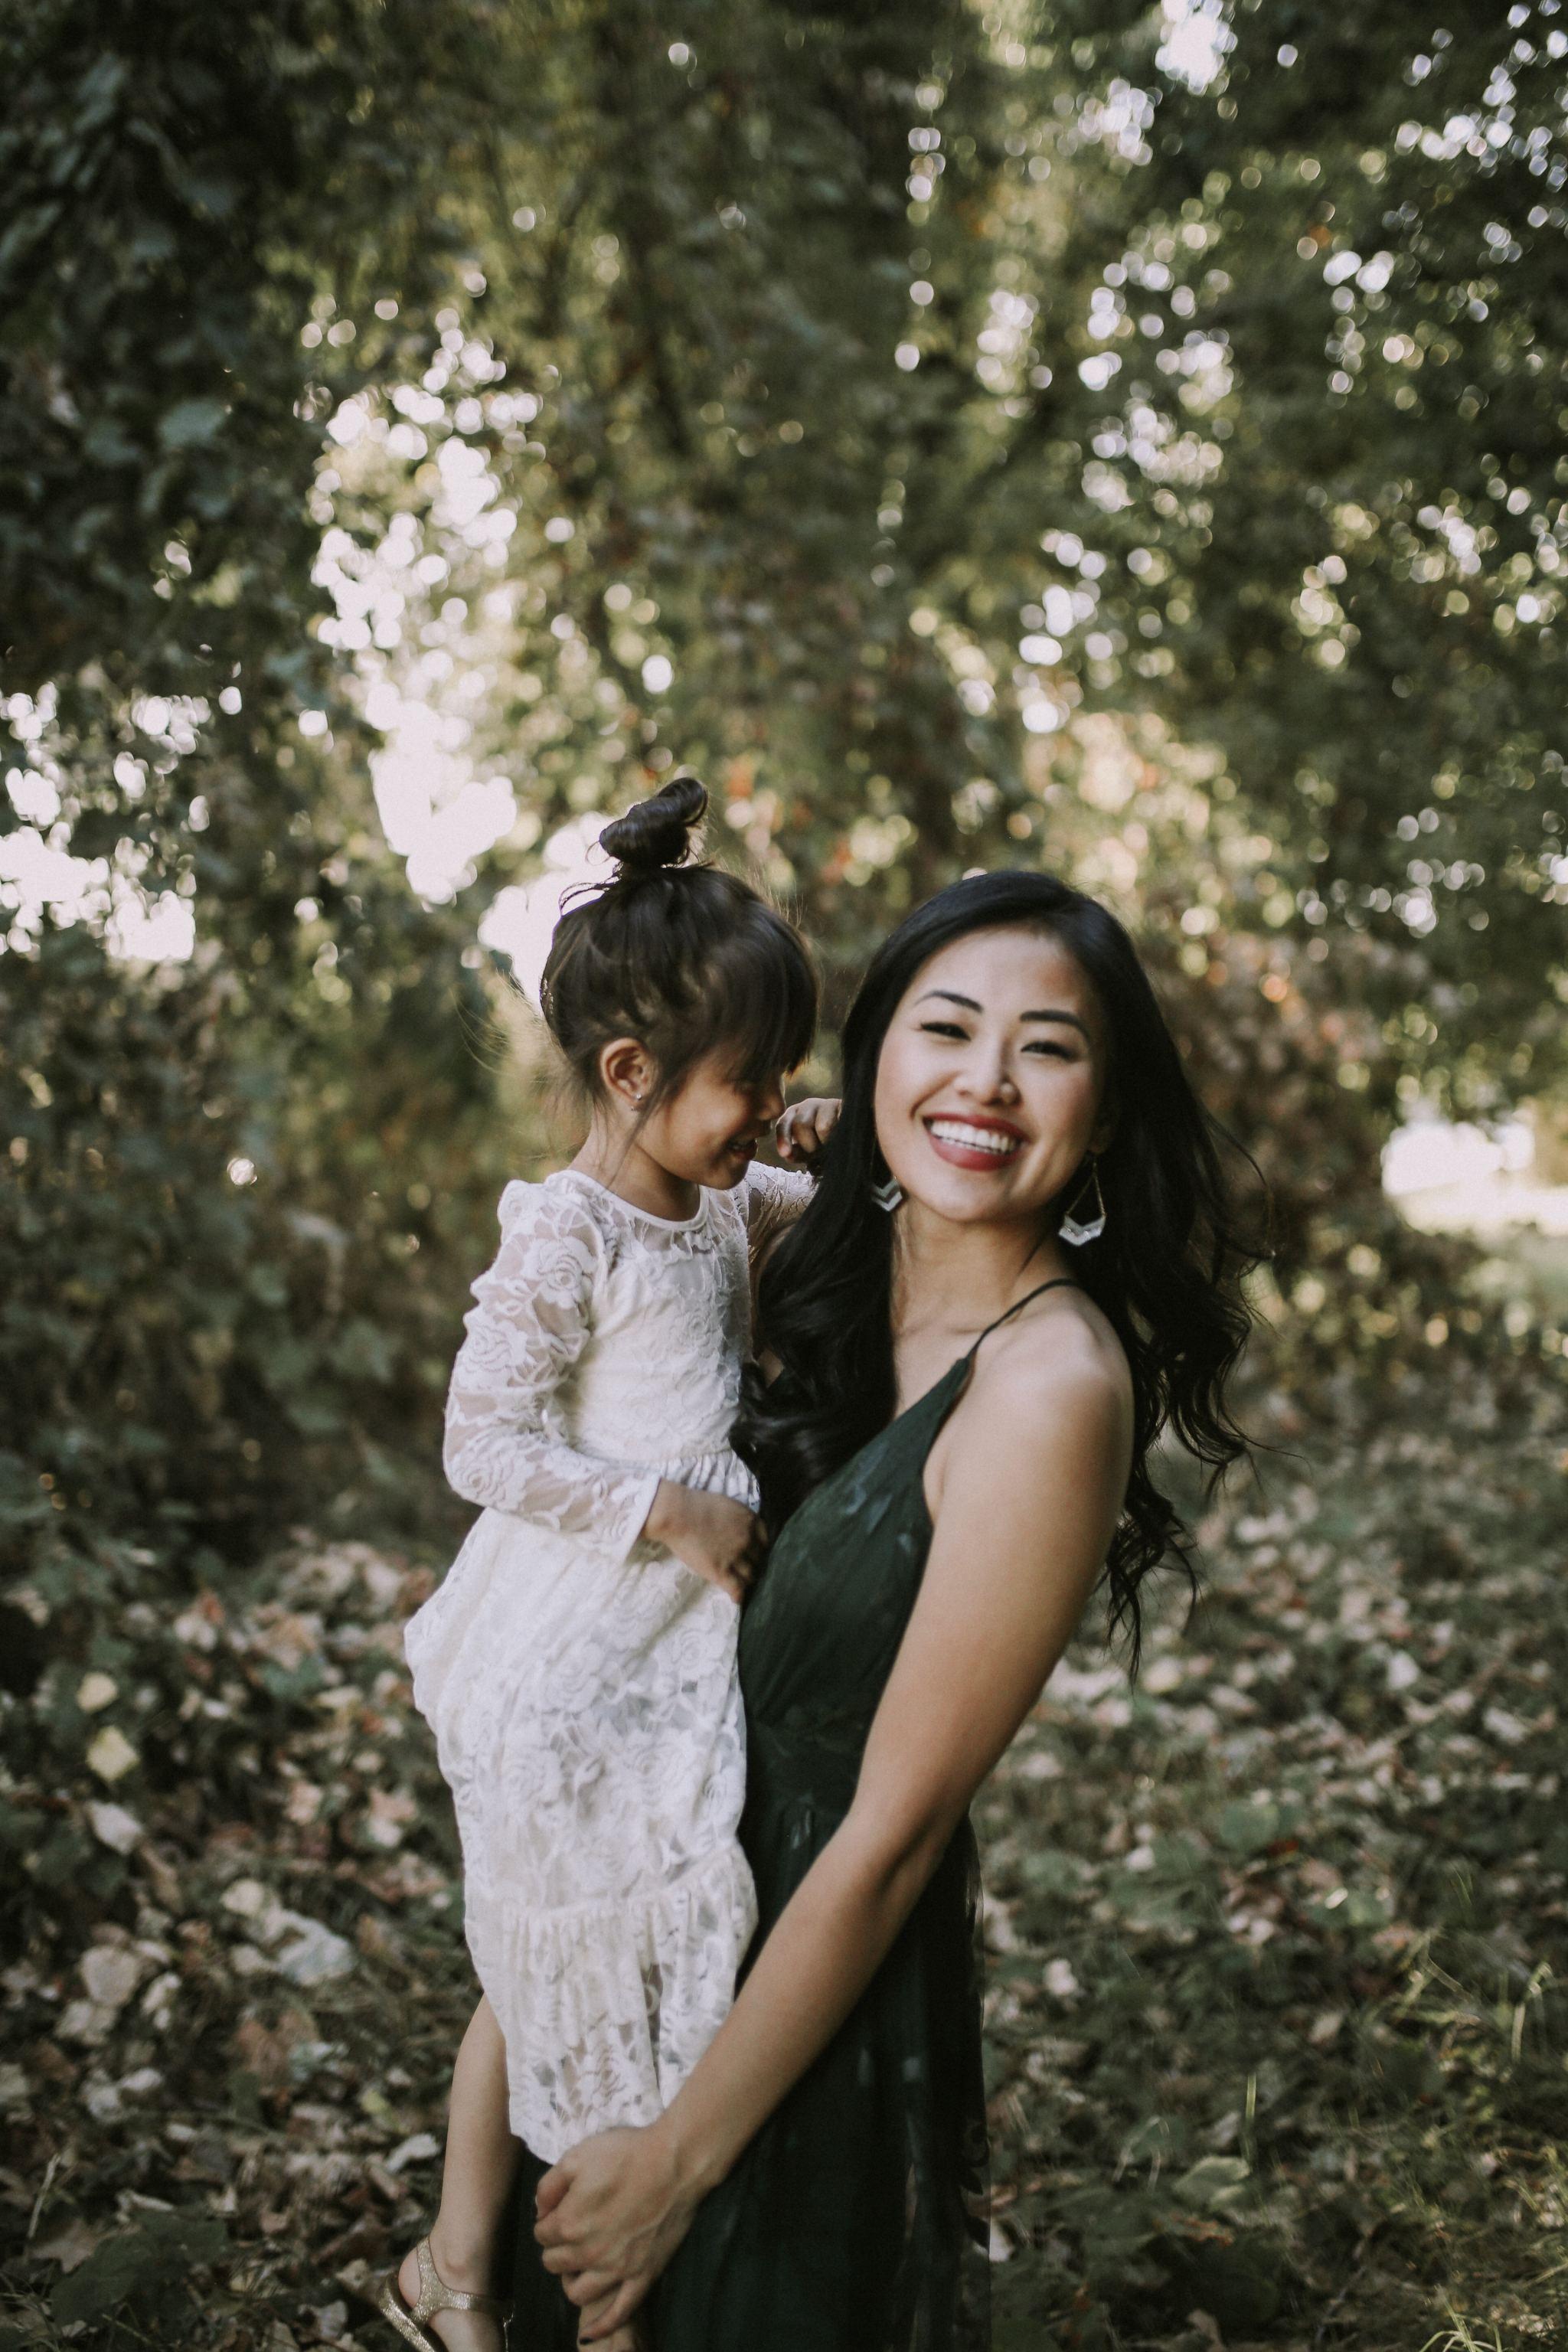 toddler white lace dress women green dress how to start a blog